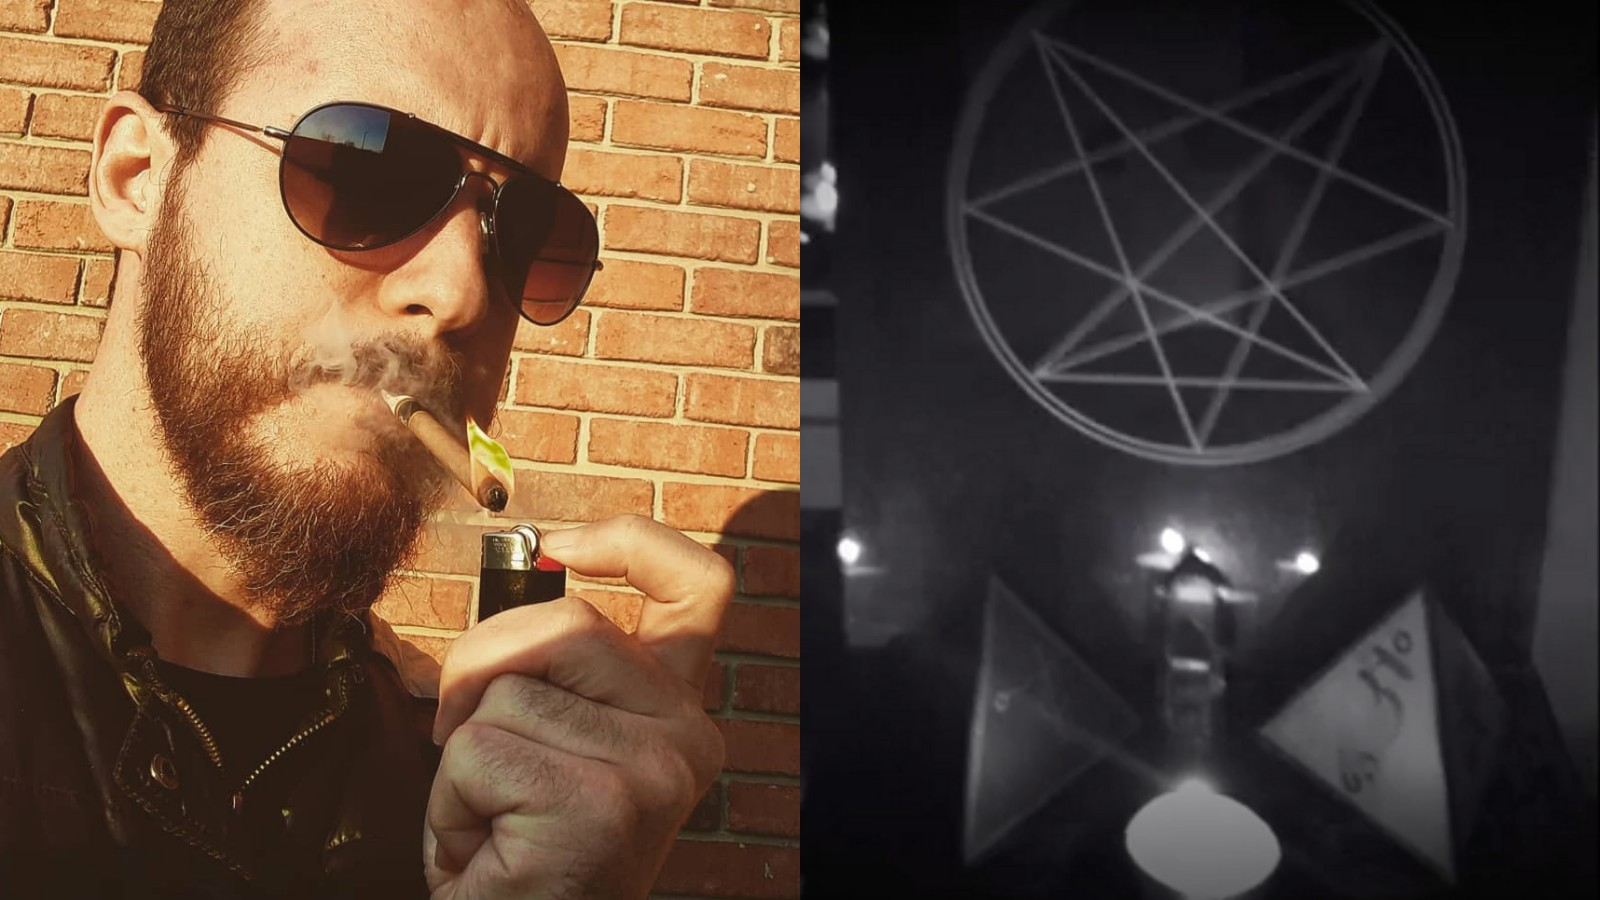 Random' Murder of Muslim Man Linked to 'Neo-Nazi Death Cult': Report